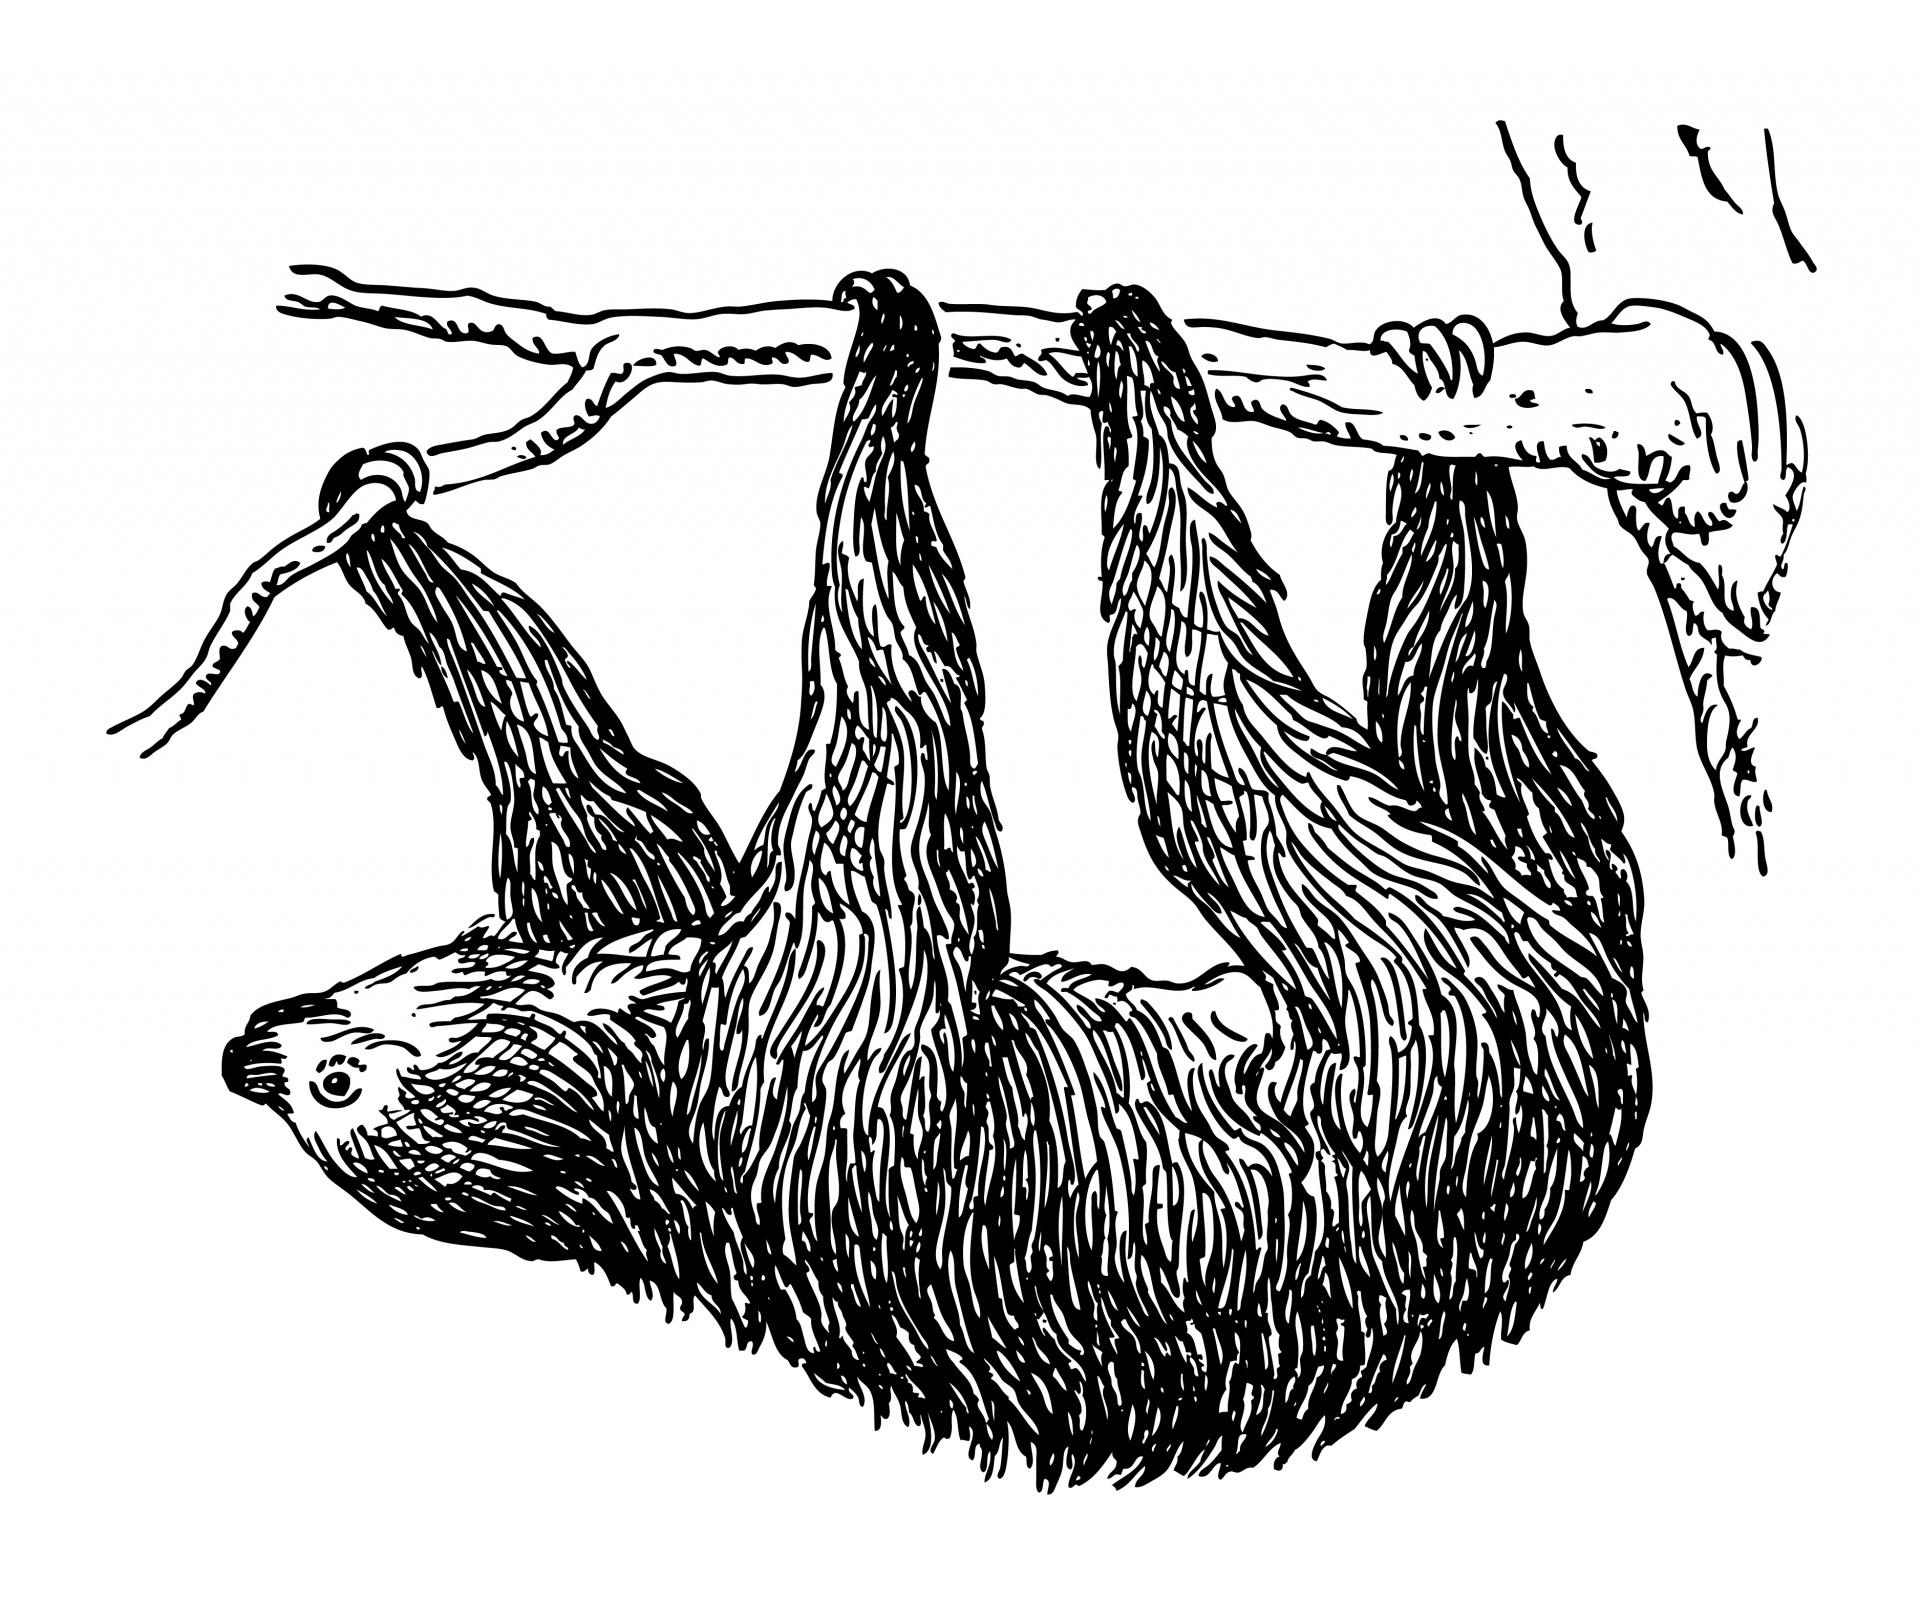 Sloth Clipart Illustration Free Stock Photo.